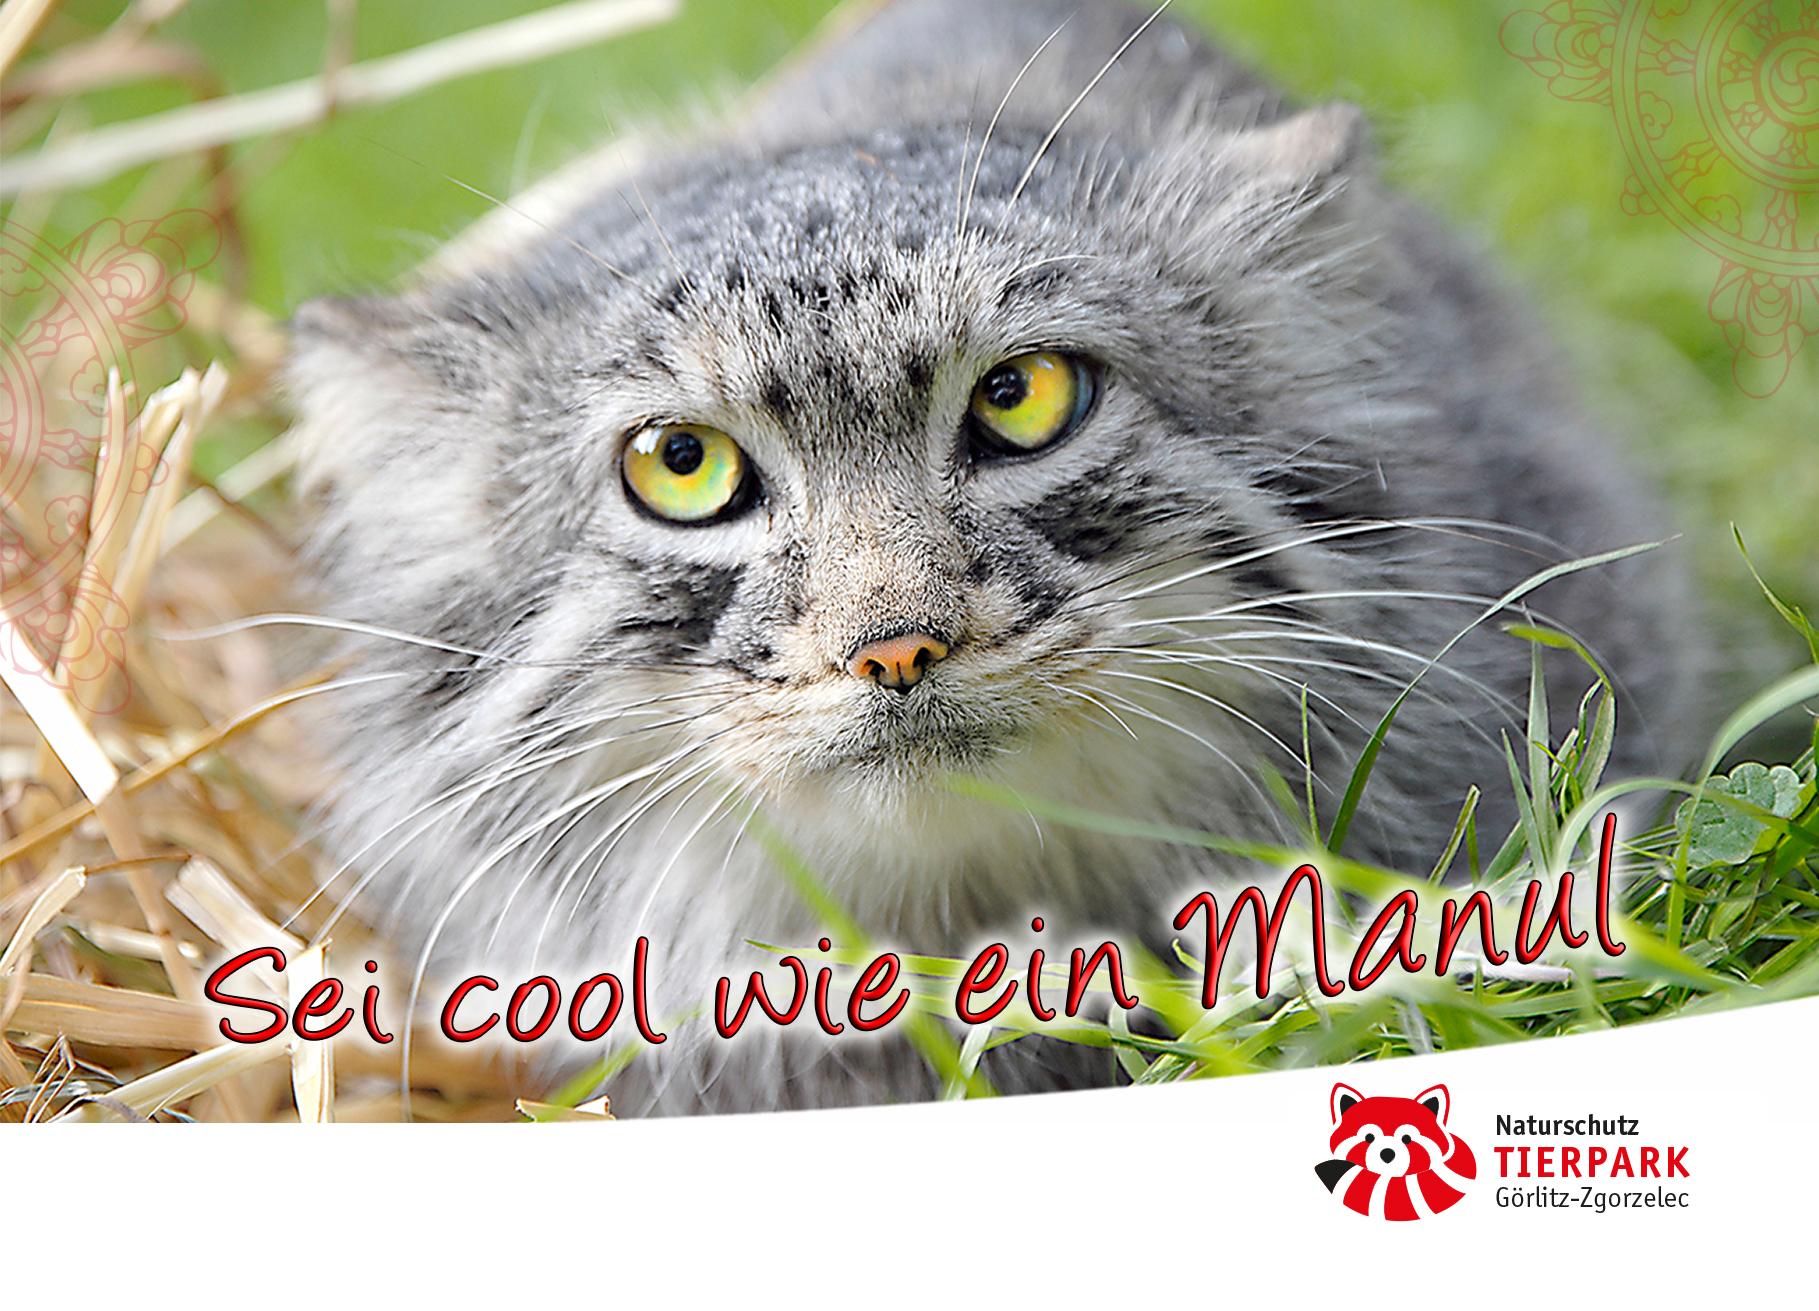 Postkarte Manul: Sei cool wie ein Manul!